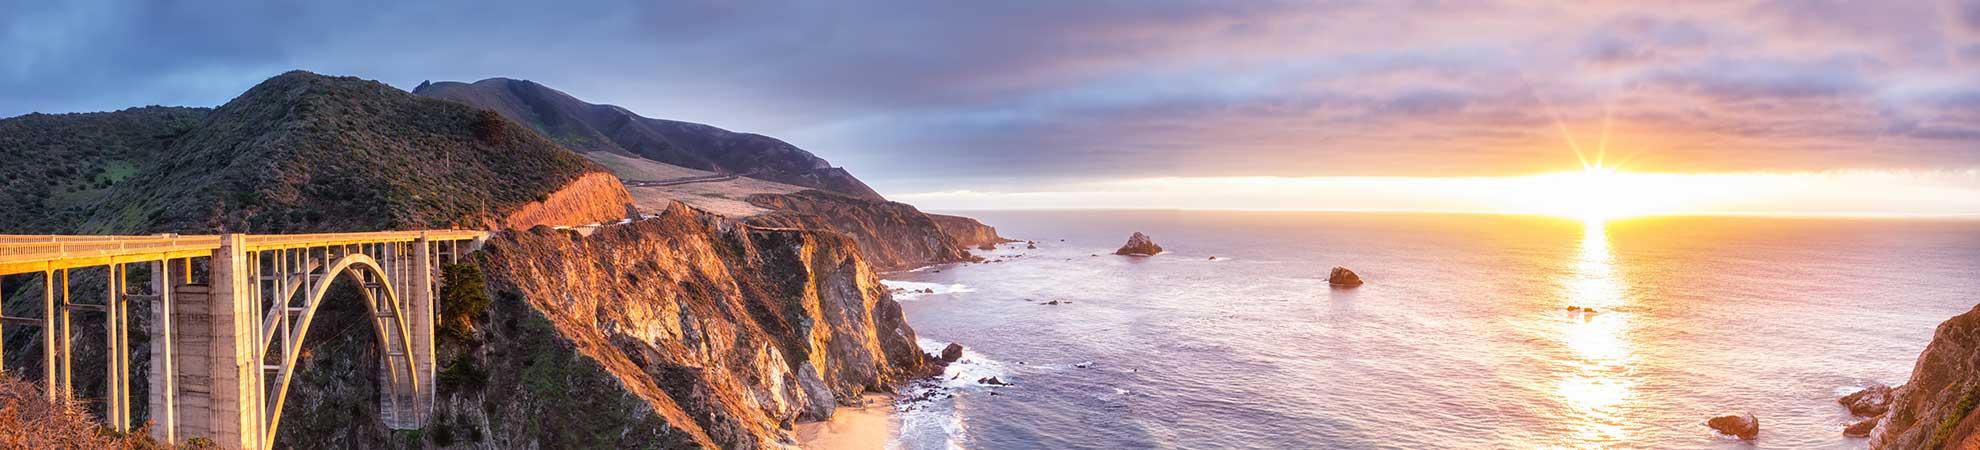 Voyage en californie en famille